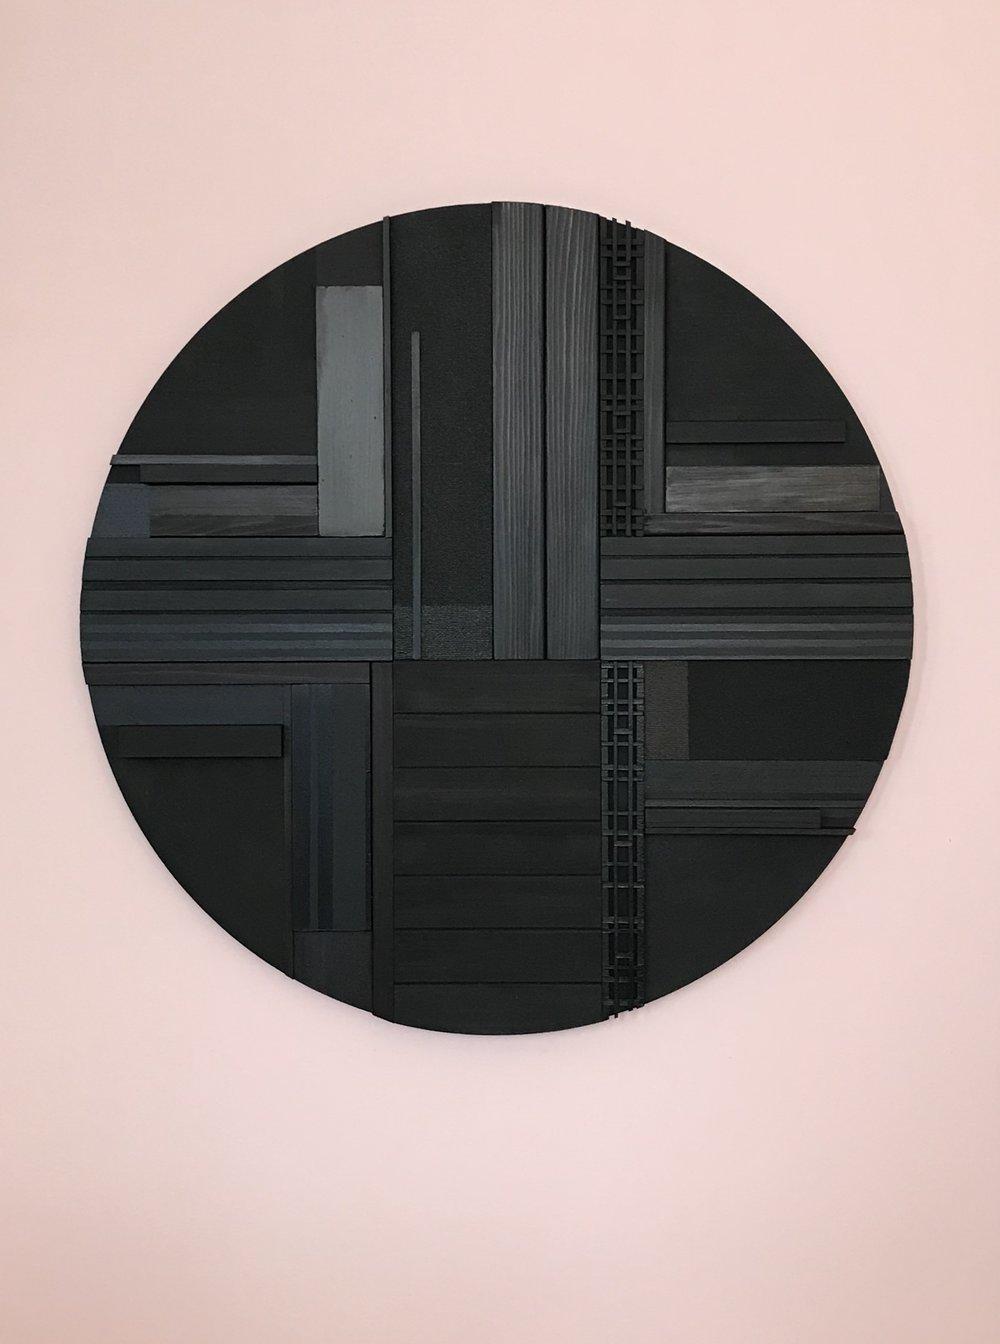 "Cameron McKay, ""Hunk"", CMK014, 2019, Acrylic,charred cedar,mdf on canvas, 40"" x 30"", $1,540.00 Unframed (+ taxes)"